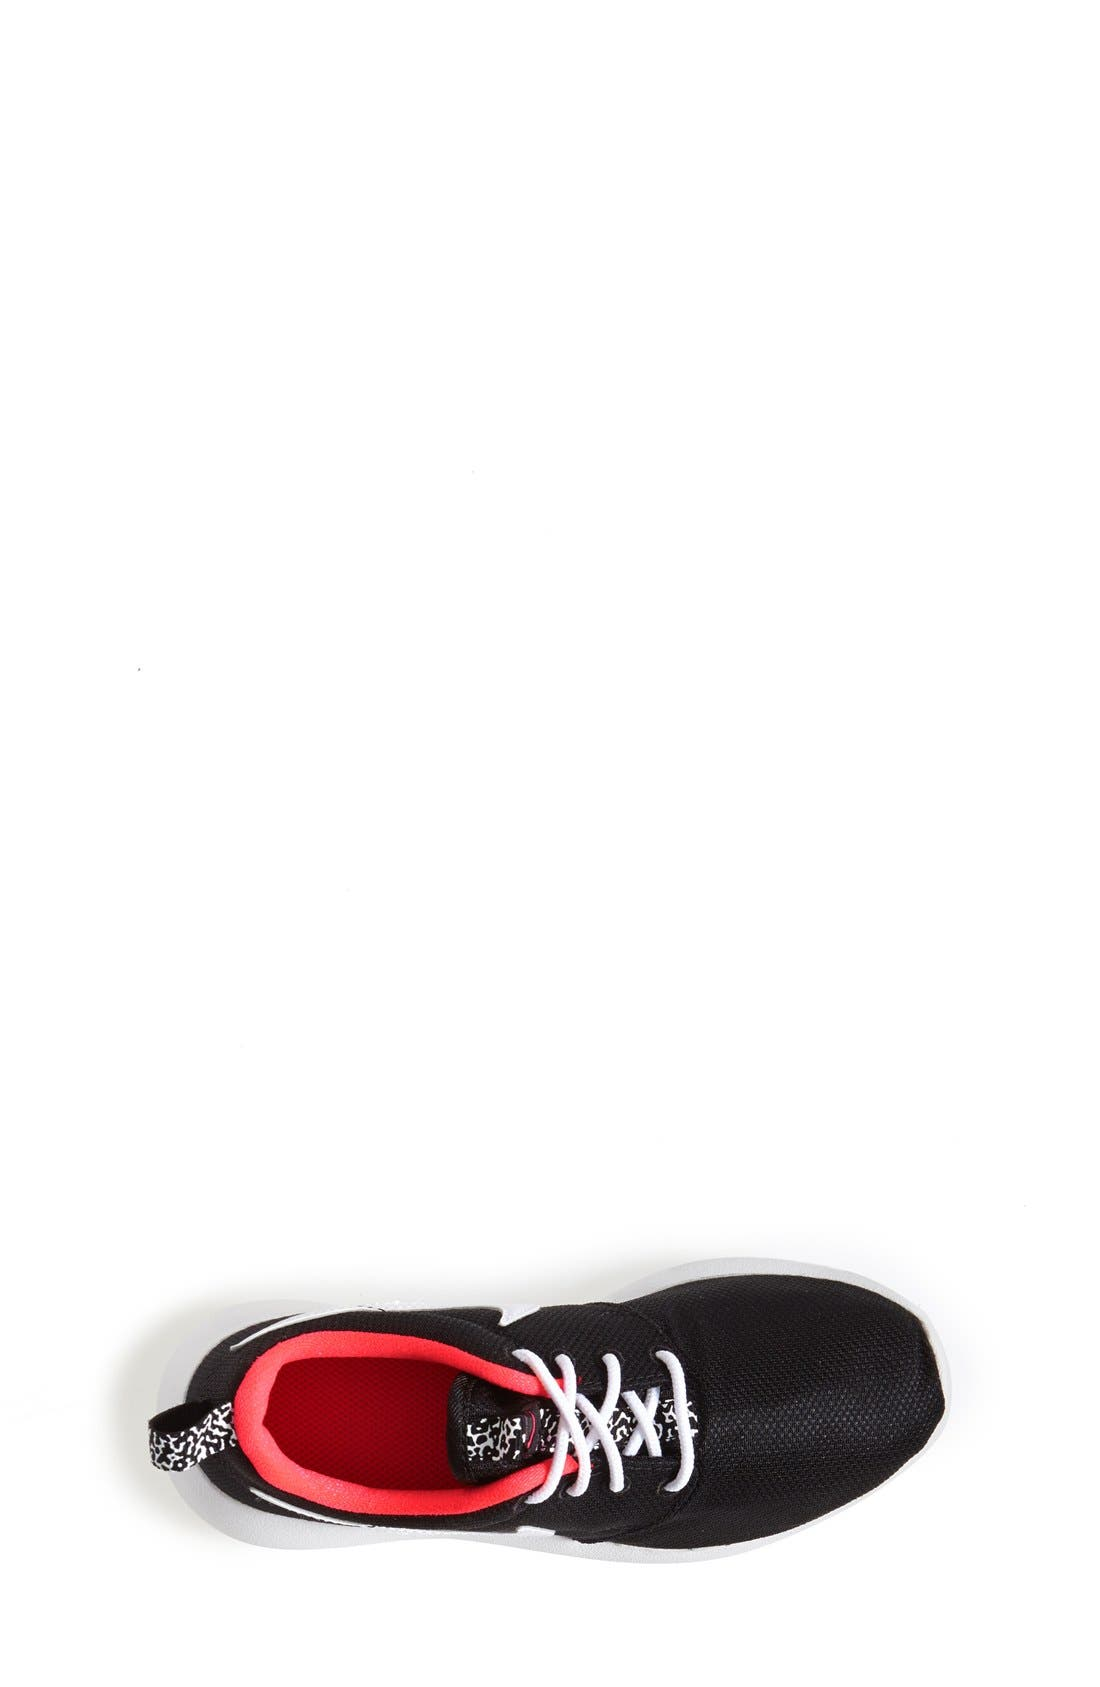 'Roshe Run' Athletic Shoe,                             Alternate thumbnail 154, color,